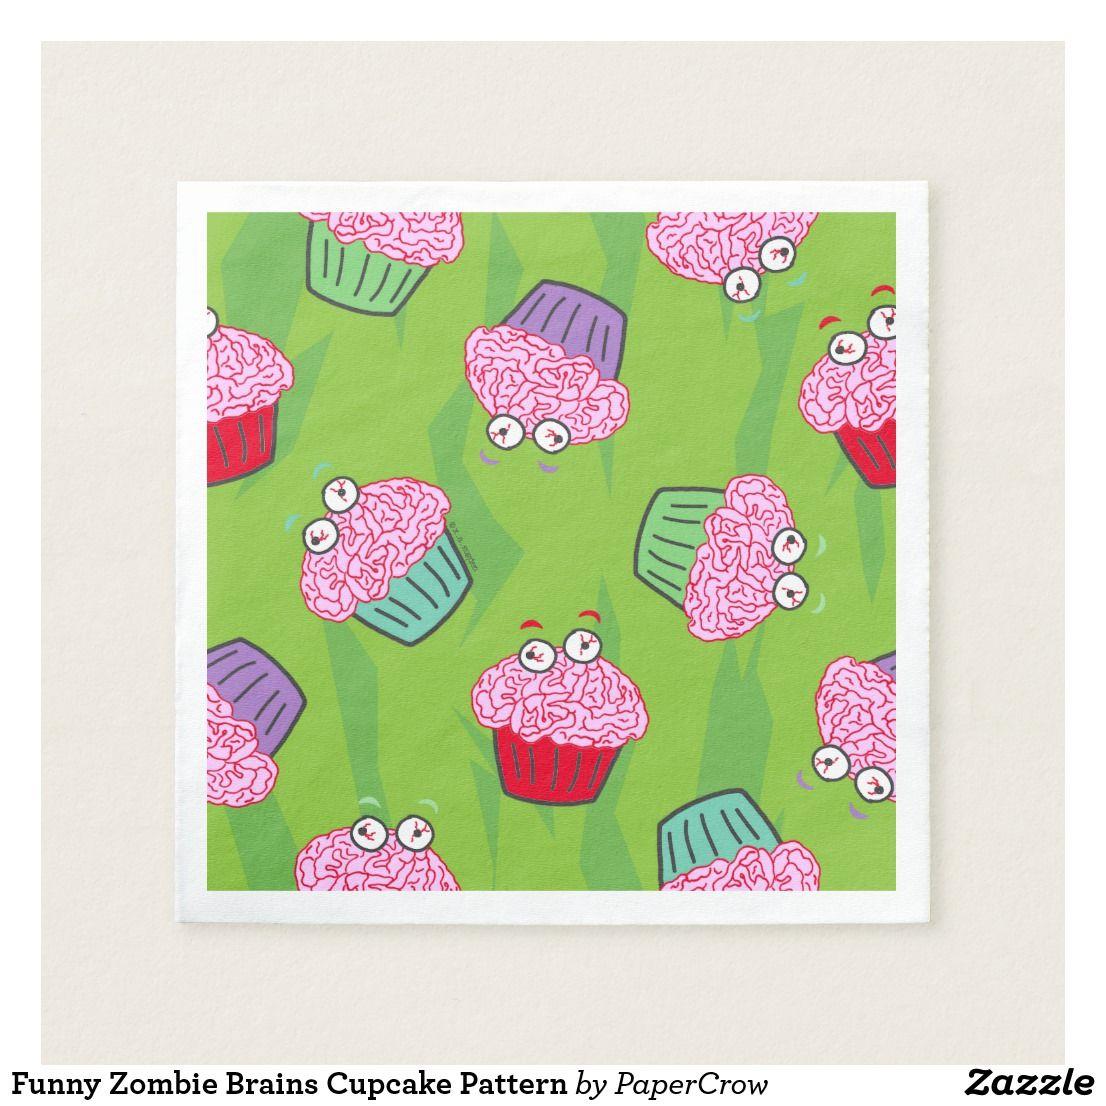 Funny Zombie Brains Cupcake Pattern Napkin